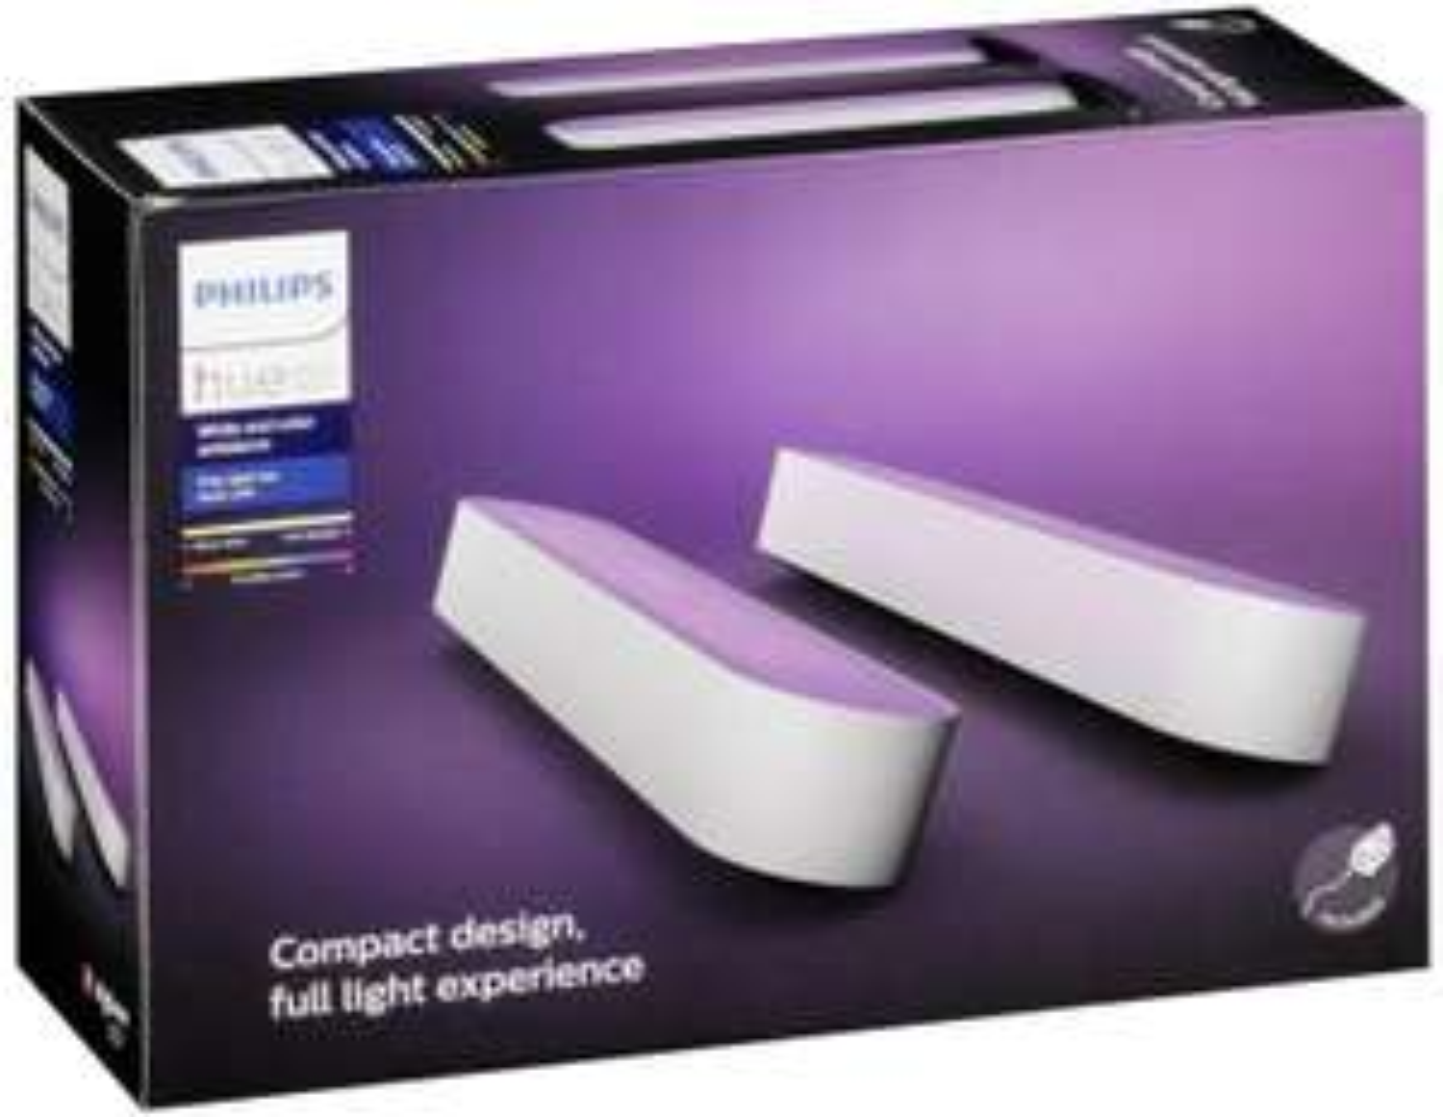 Philips Hue Play Lightbar Doppelpack für 84,85€ inkl. Versandkosten